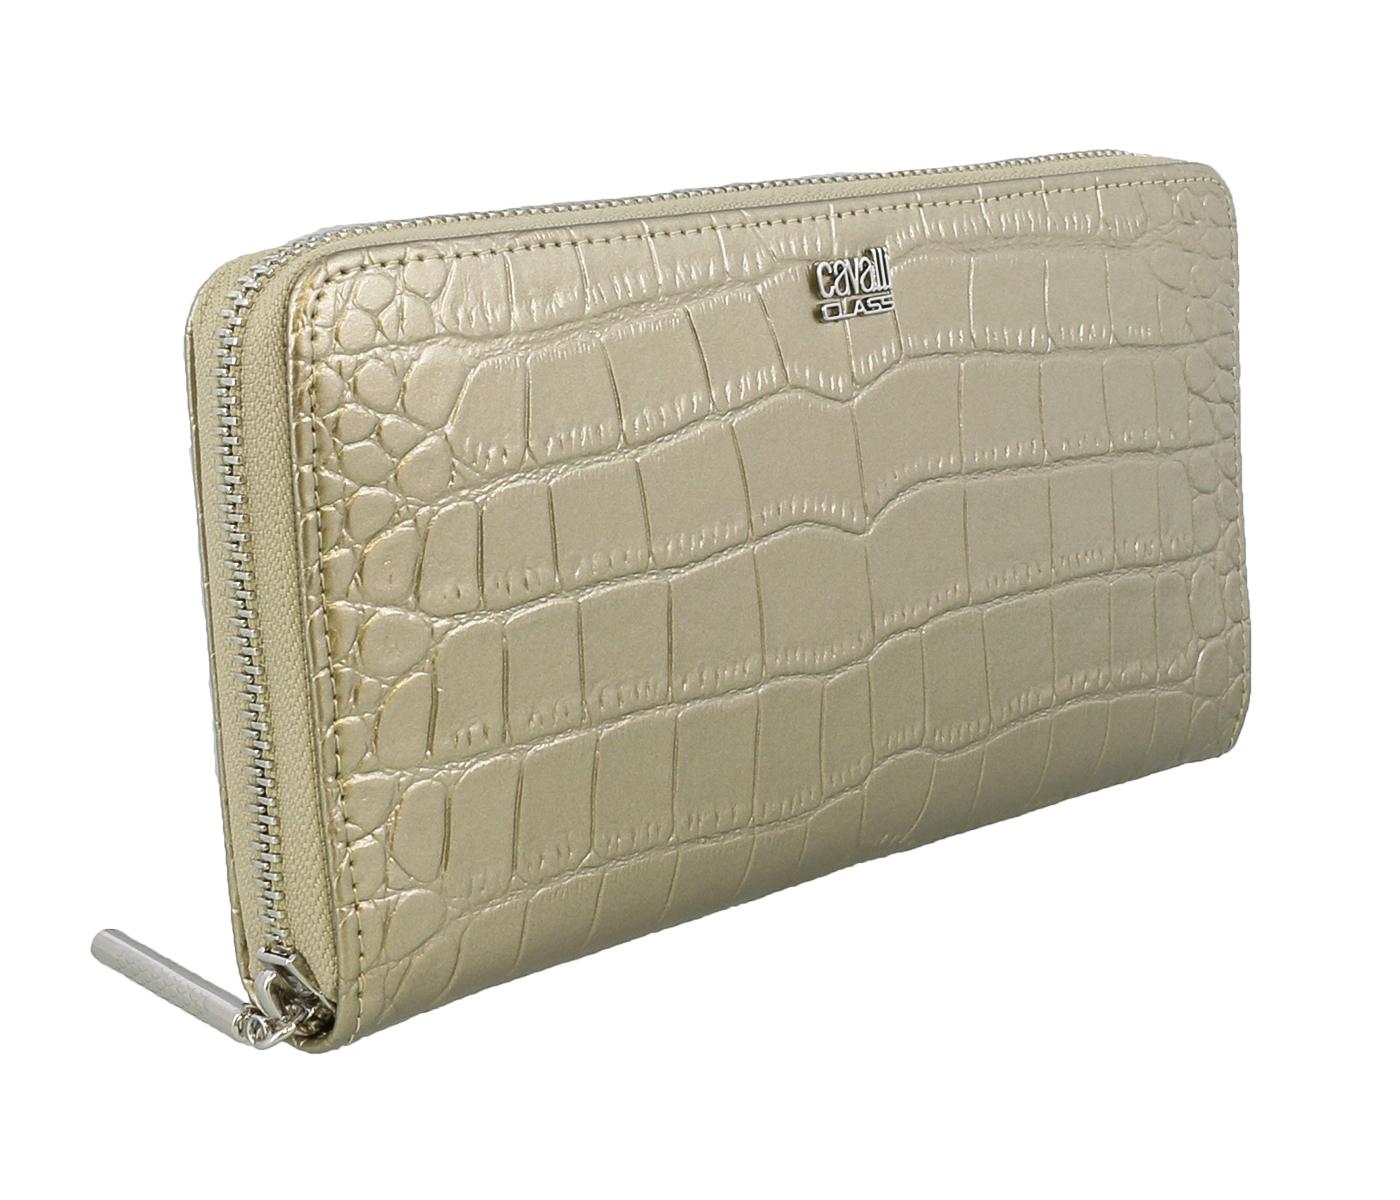 Class Roberto Cavalli London 192 Platinum Wallet On a Chain